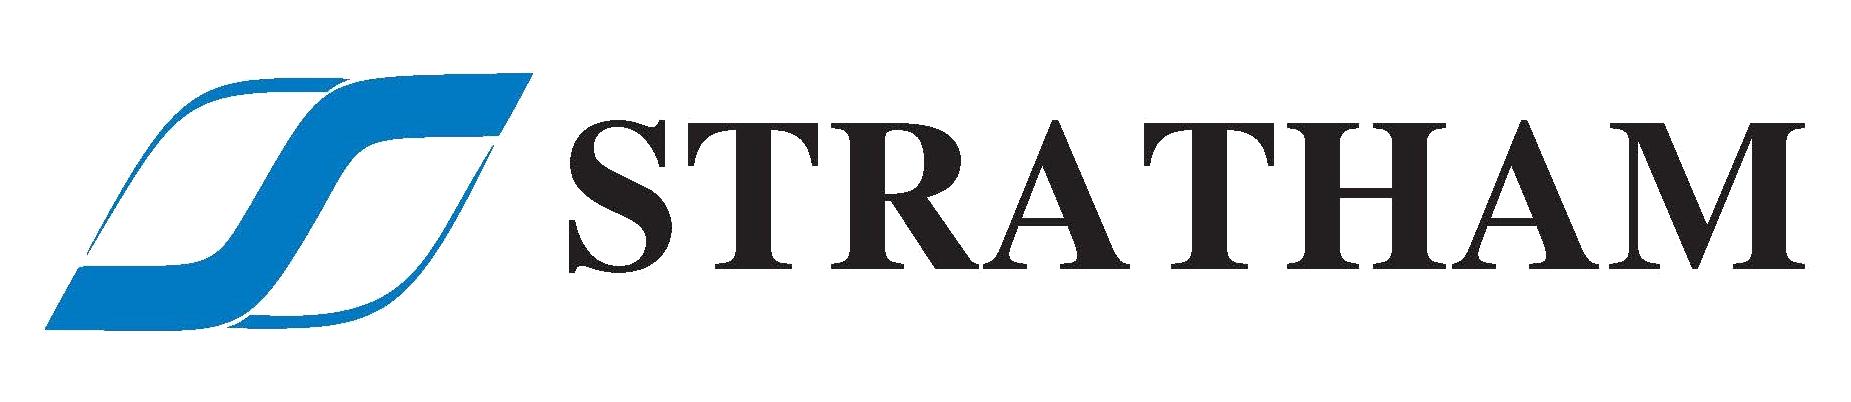 17_BBQ_Stratham_Logo.png